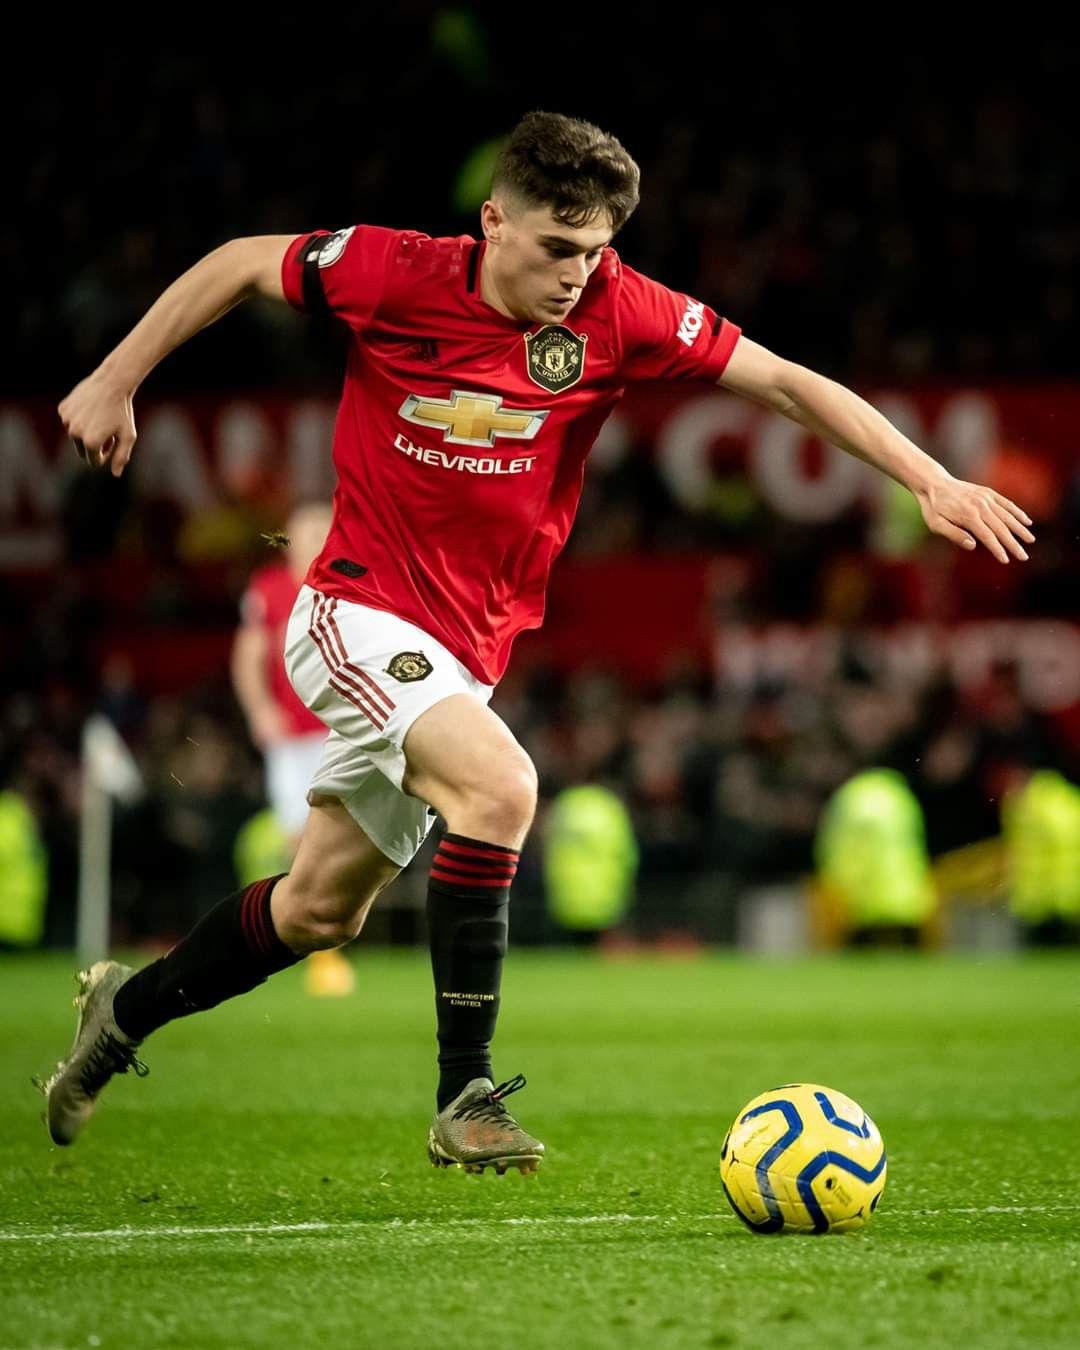 Pin By Zoro Ziggernib On Manchester United Season 2019 20 In 2020 Football Man Utd Manchester United Manchester United Football Club